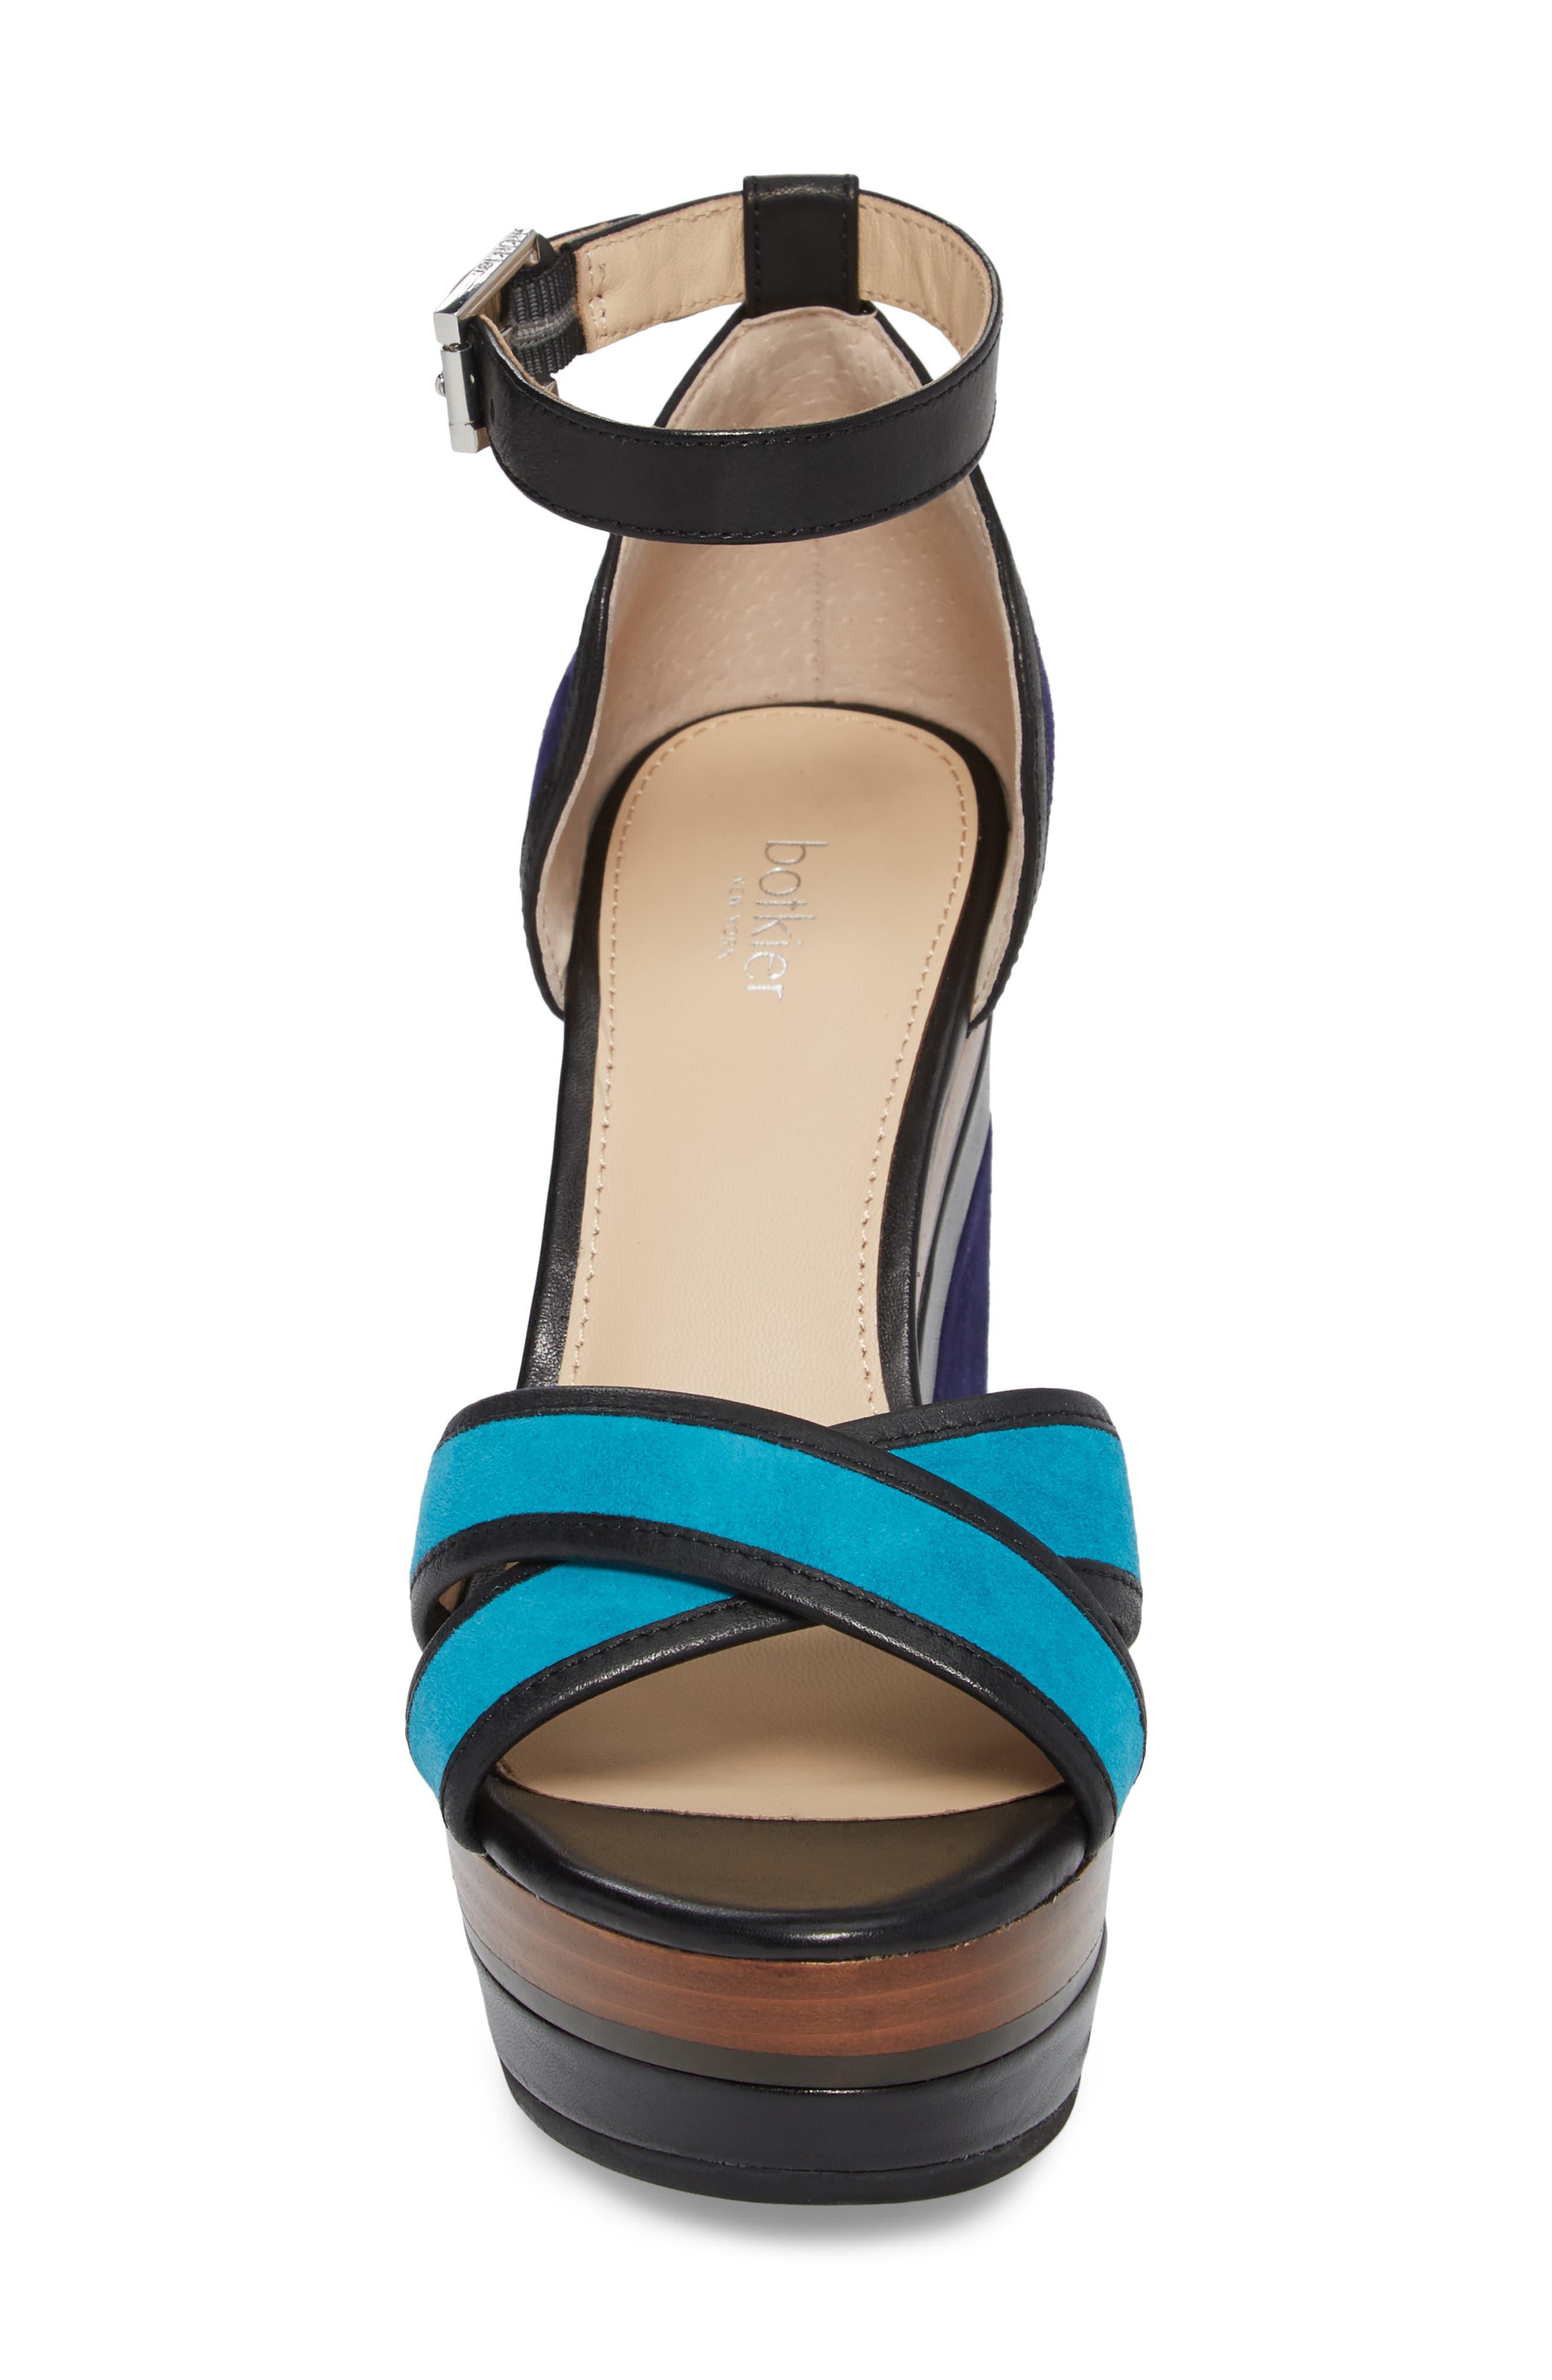 Paloma Ankle Strap Sandal,                             Alternate thumbnail 4, color,                             Ultra Marine Suede